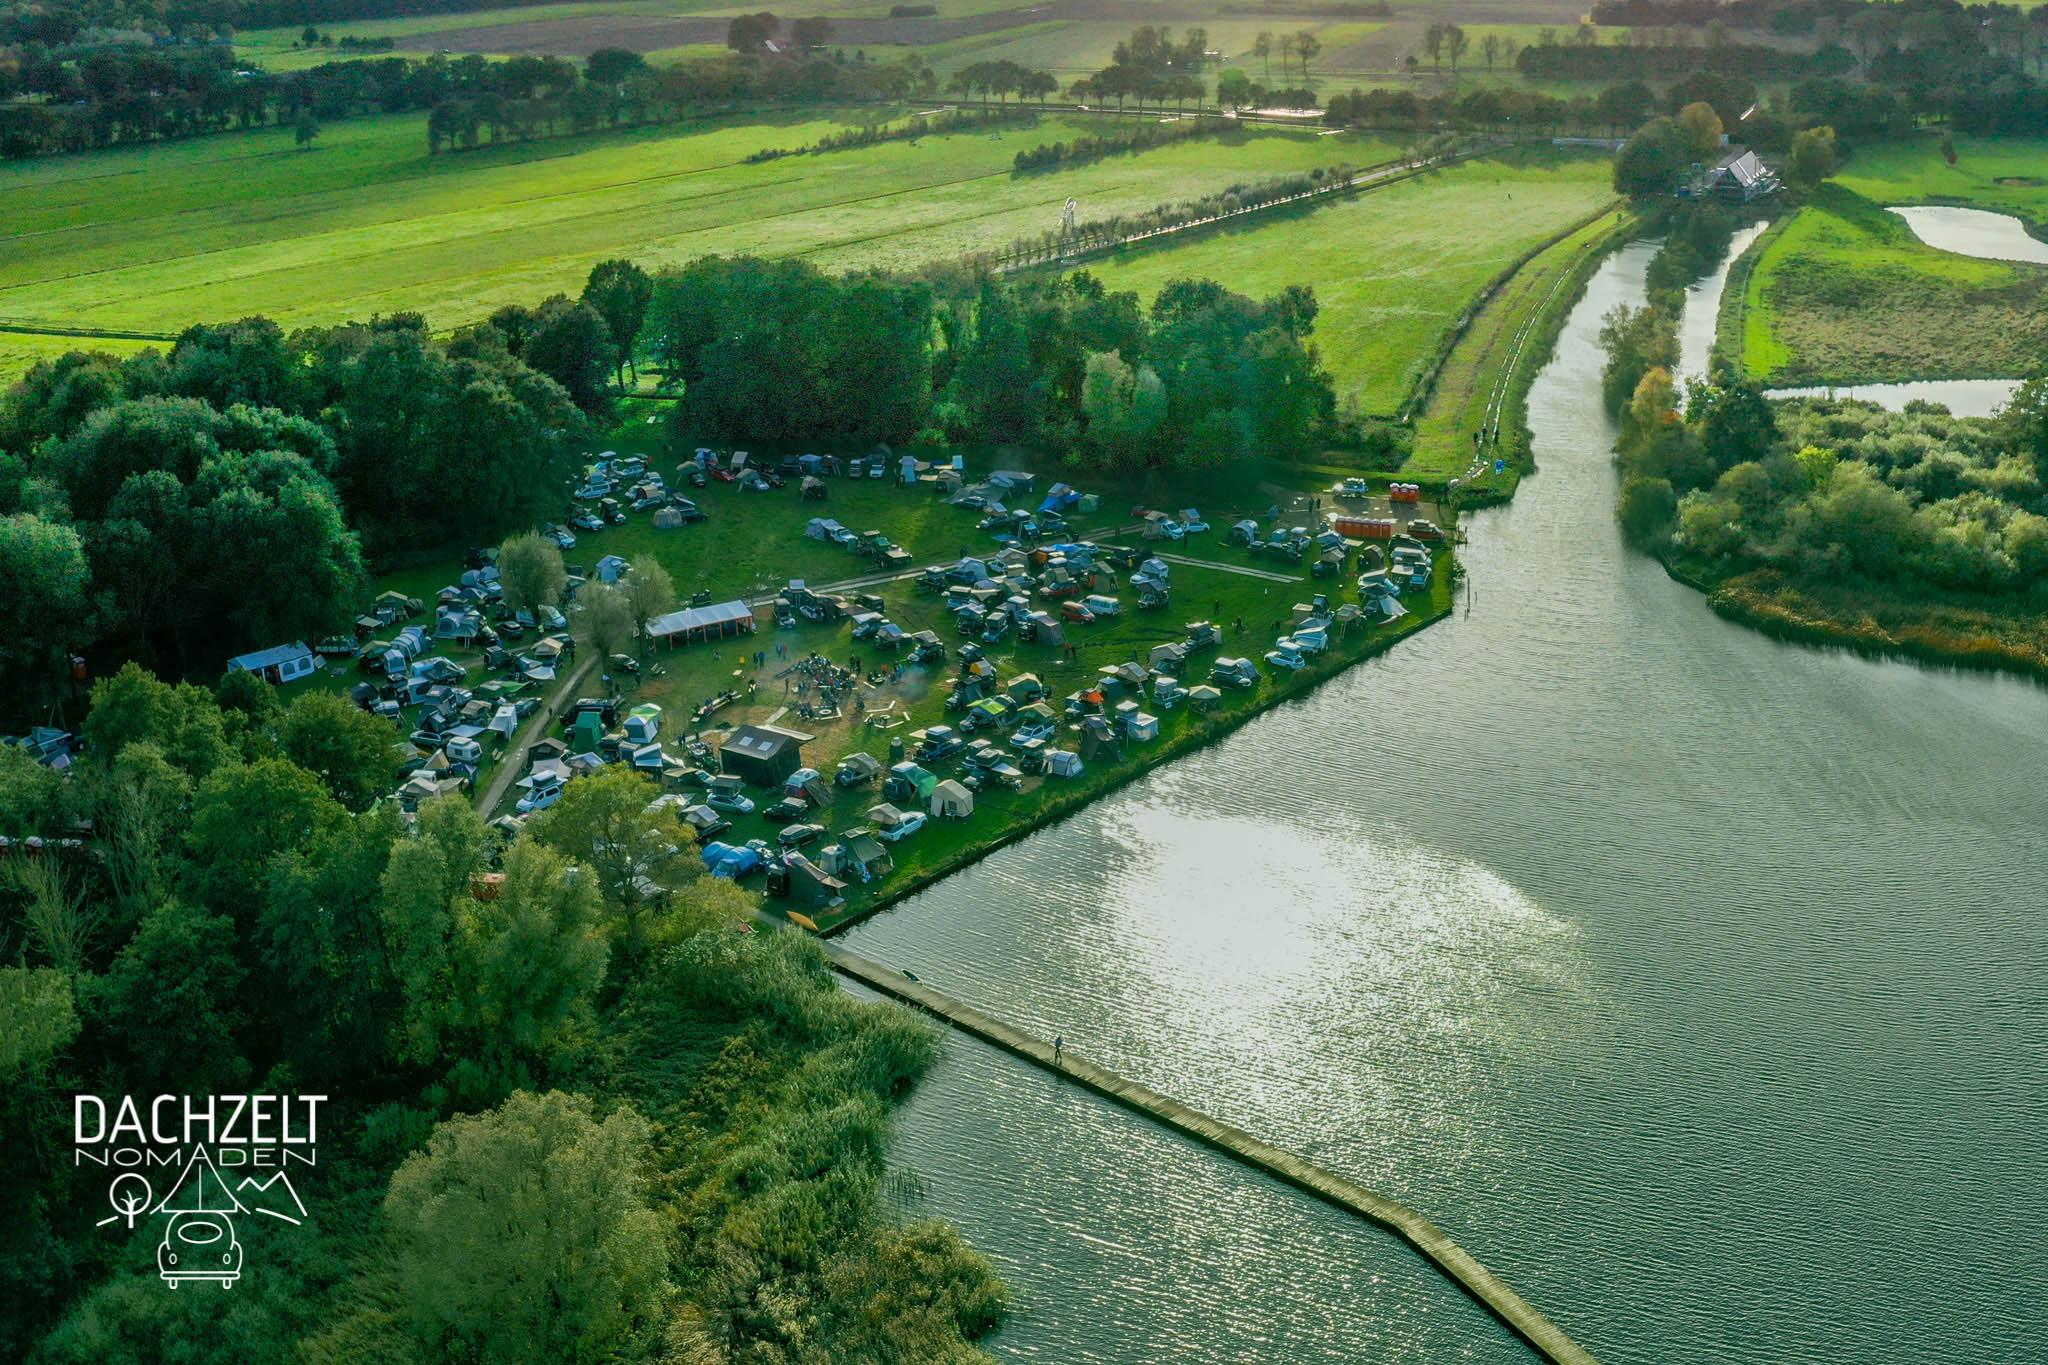 20191019-Dachzelt-Camp-Speciaal-DJI_0258-Pano